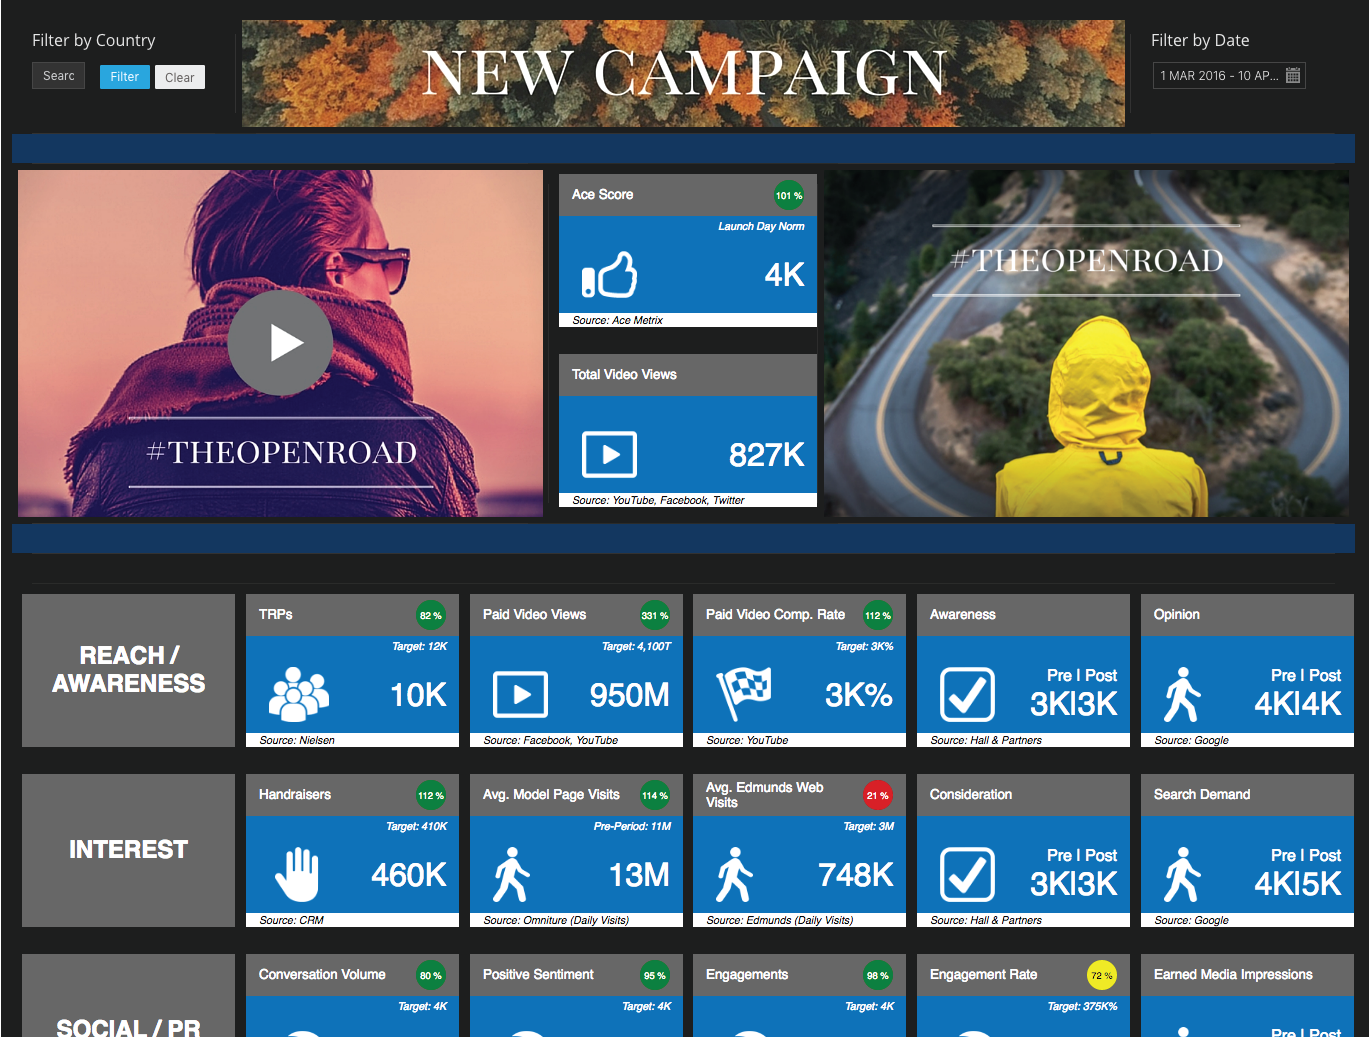 Datorama Demo - Campaign Example